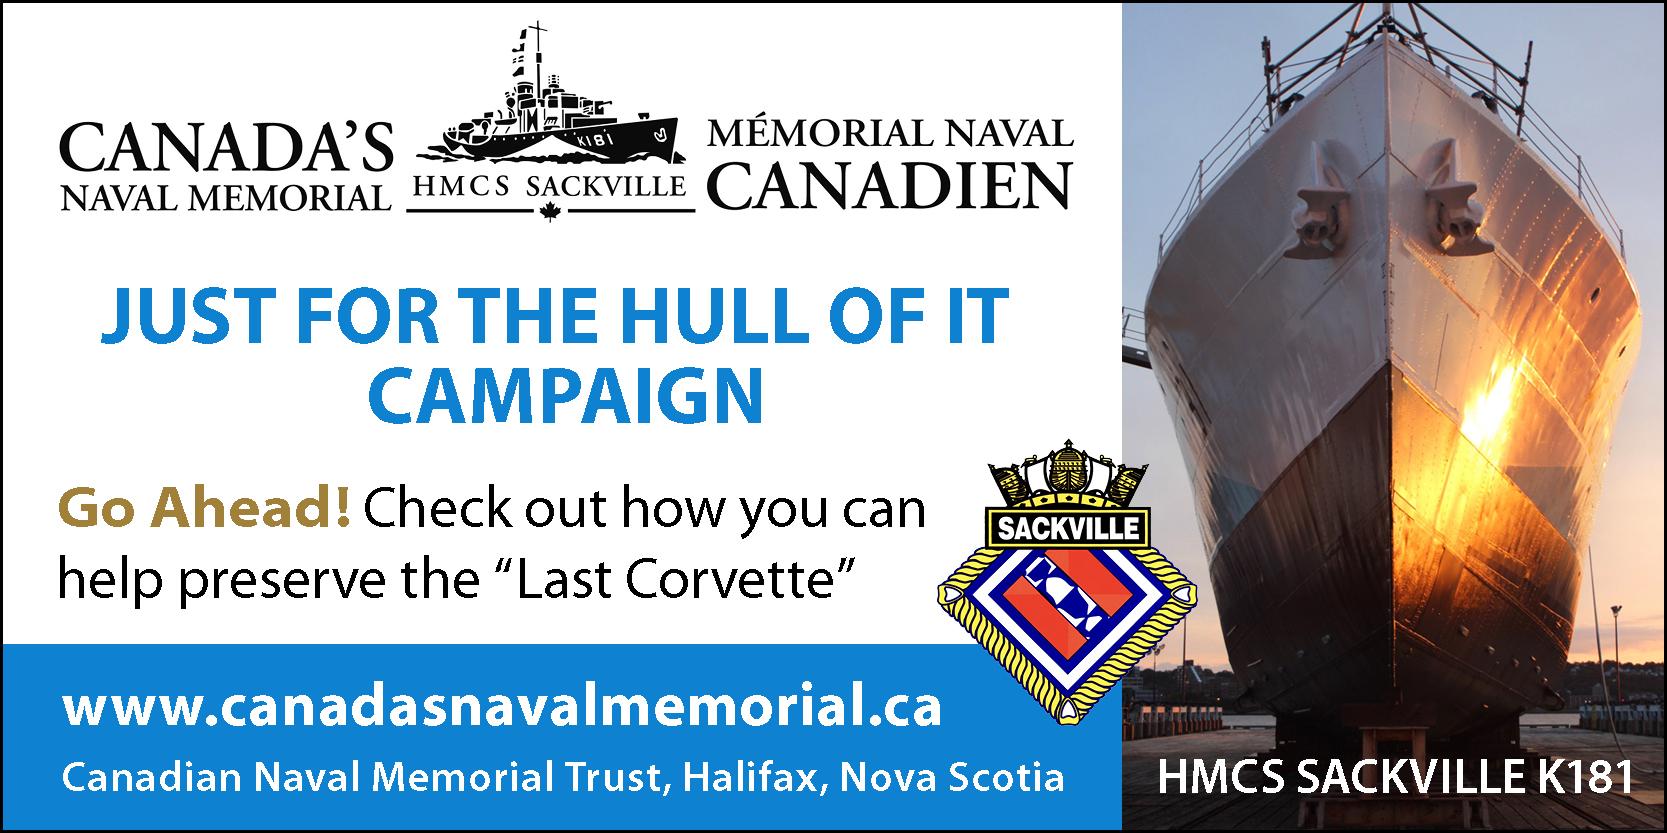 HMCS Sackville